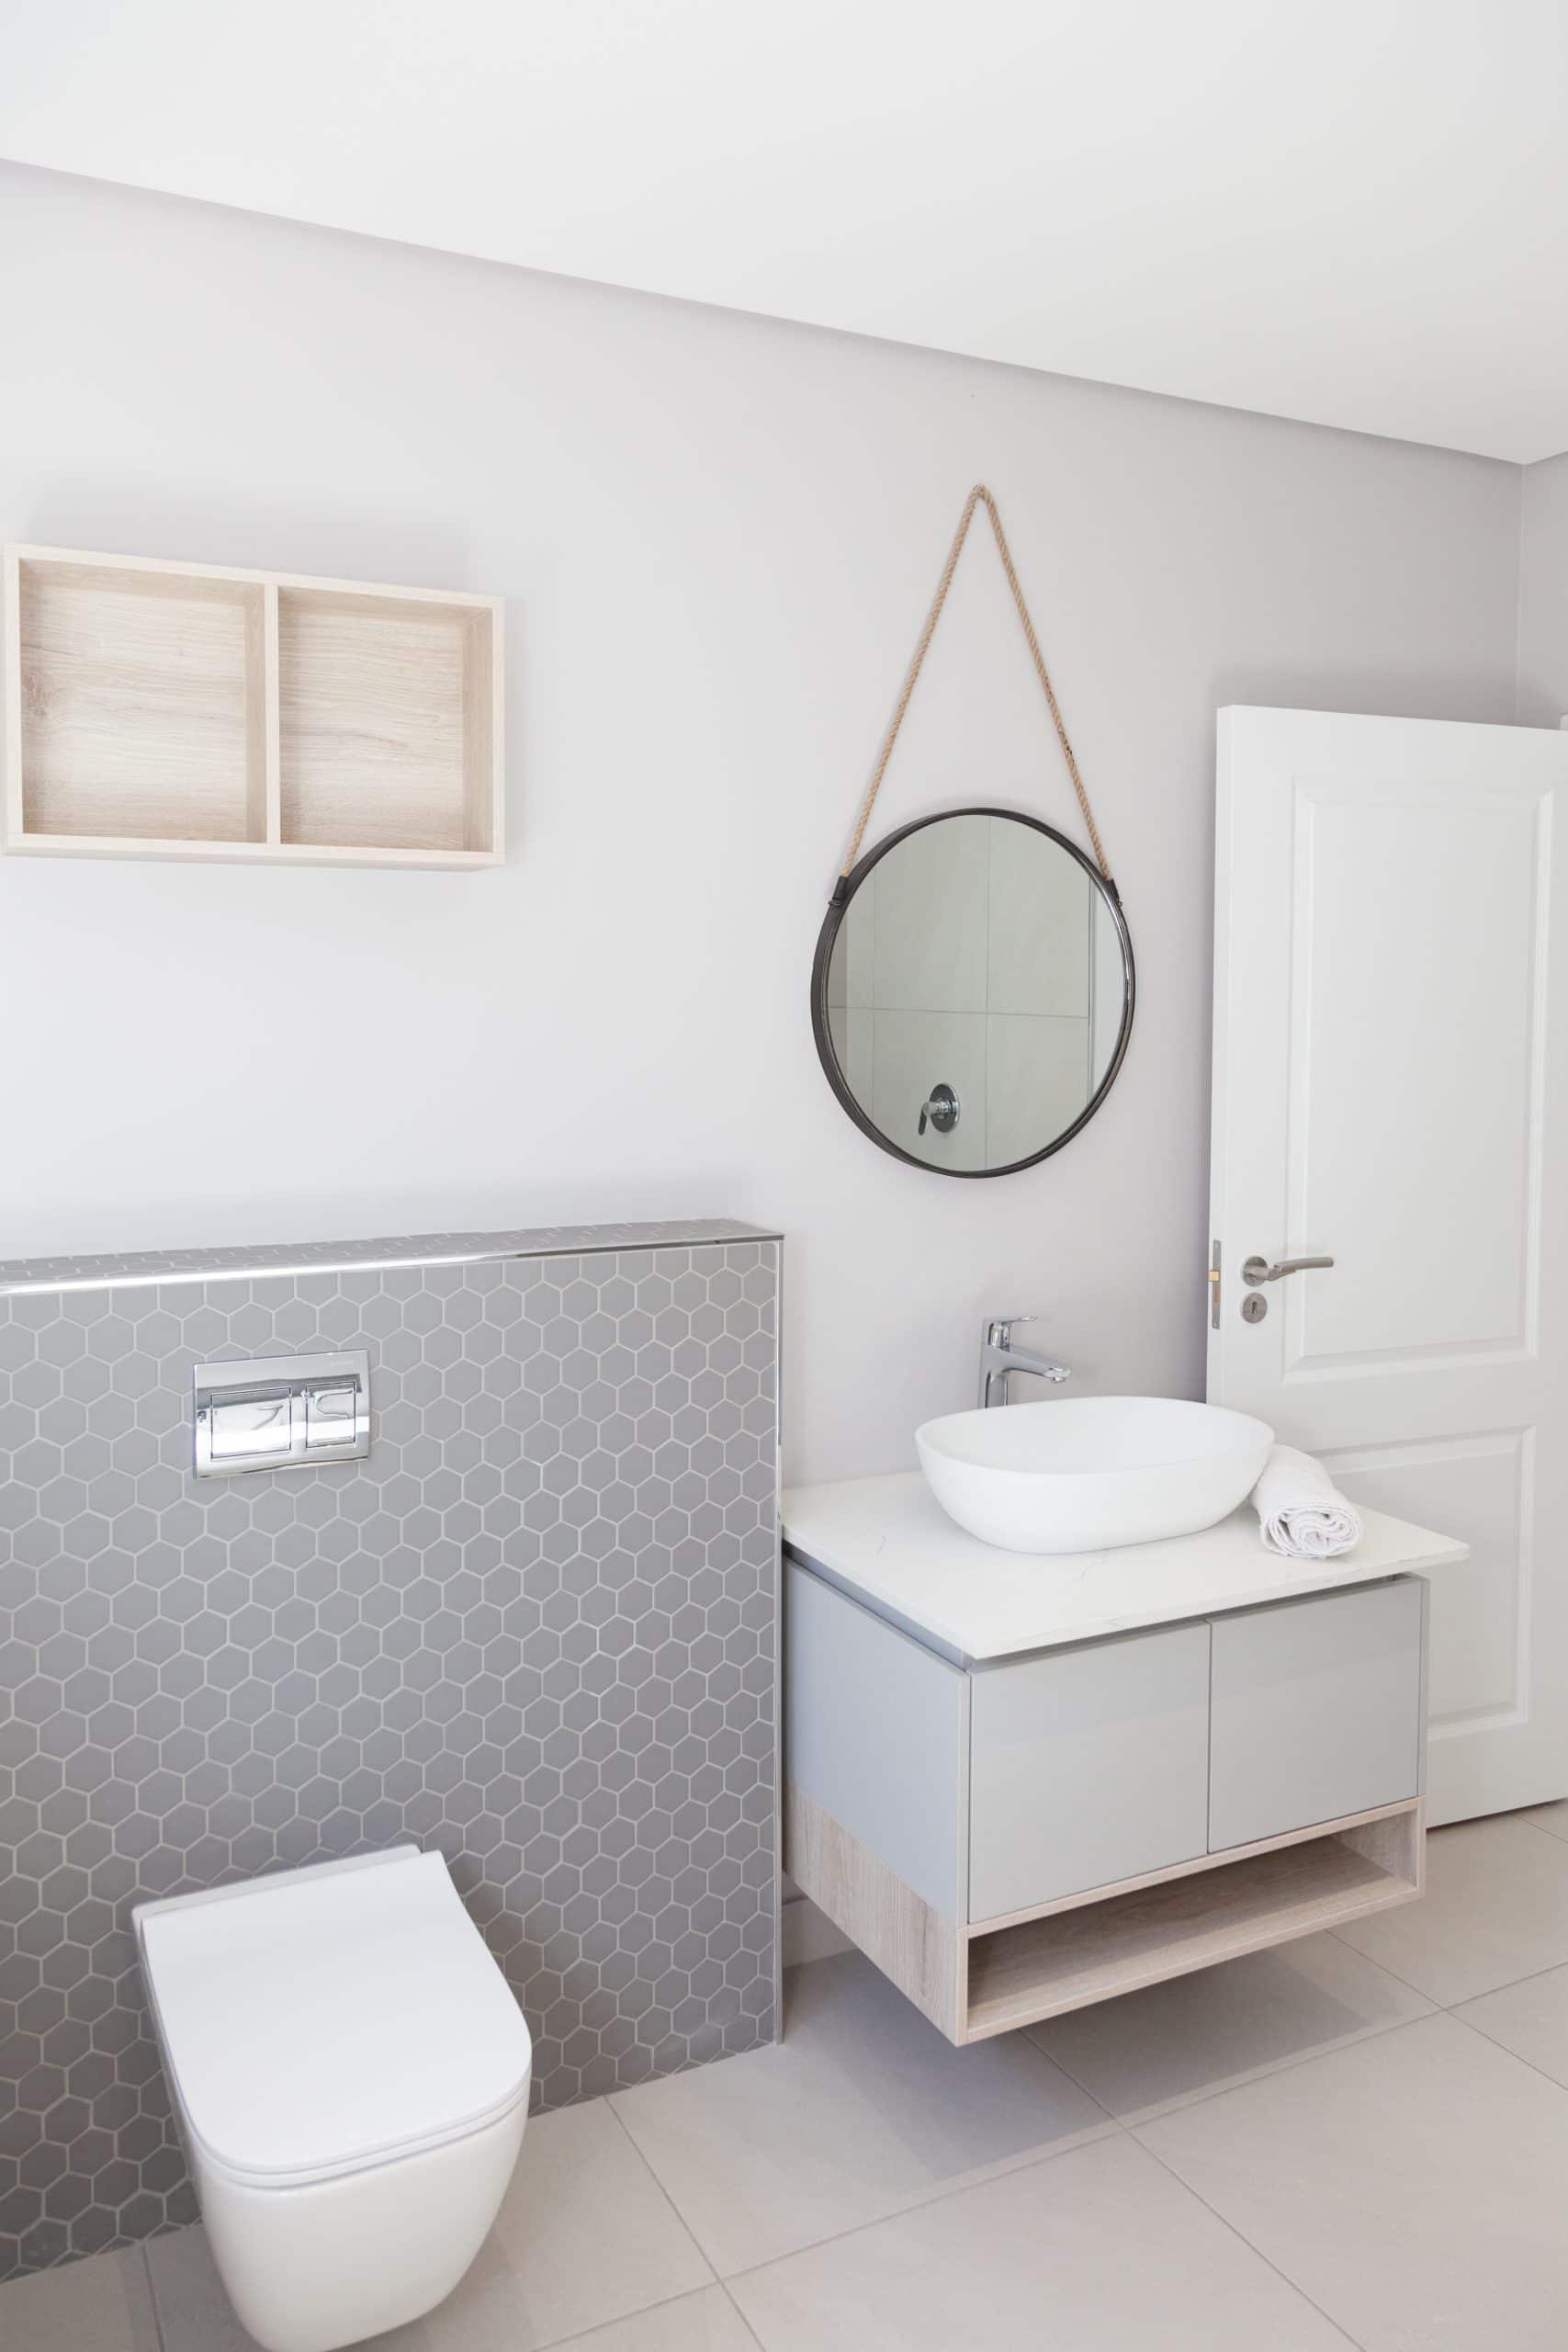 geberit wall hang cistern grey mosaics corricraft round mirror